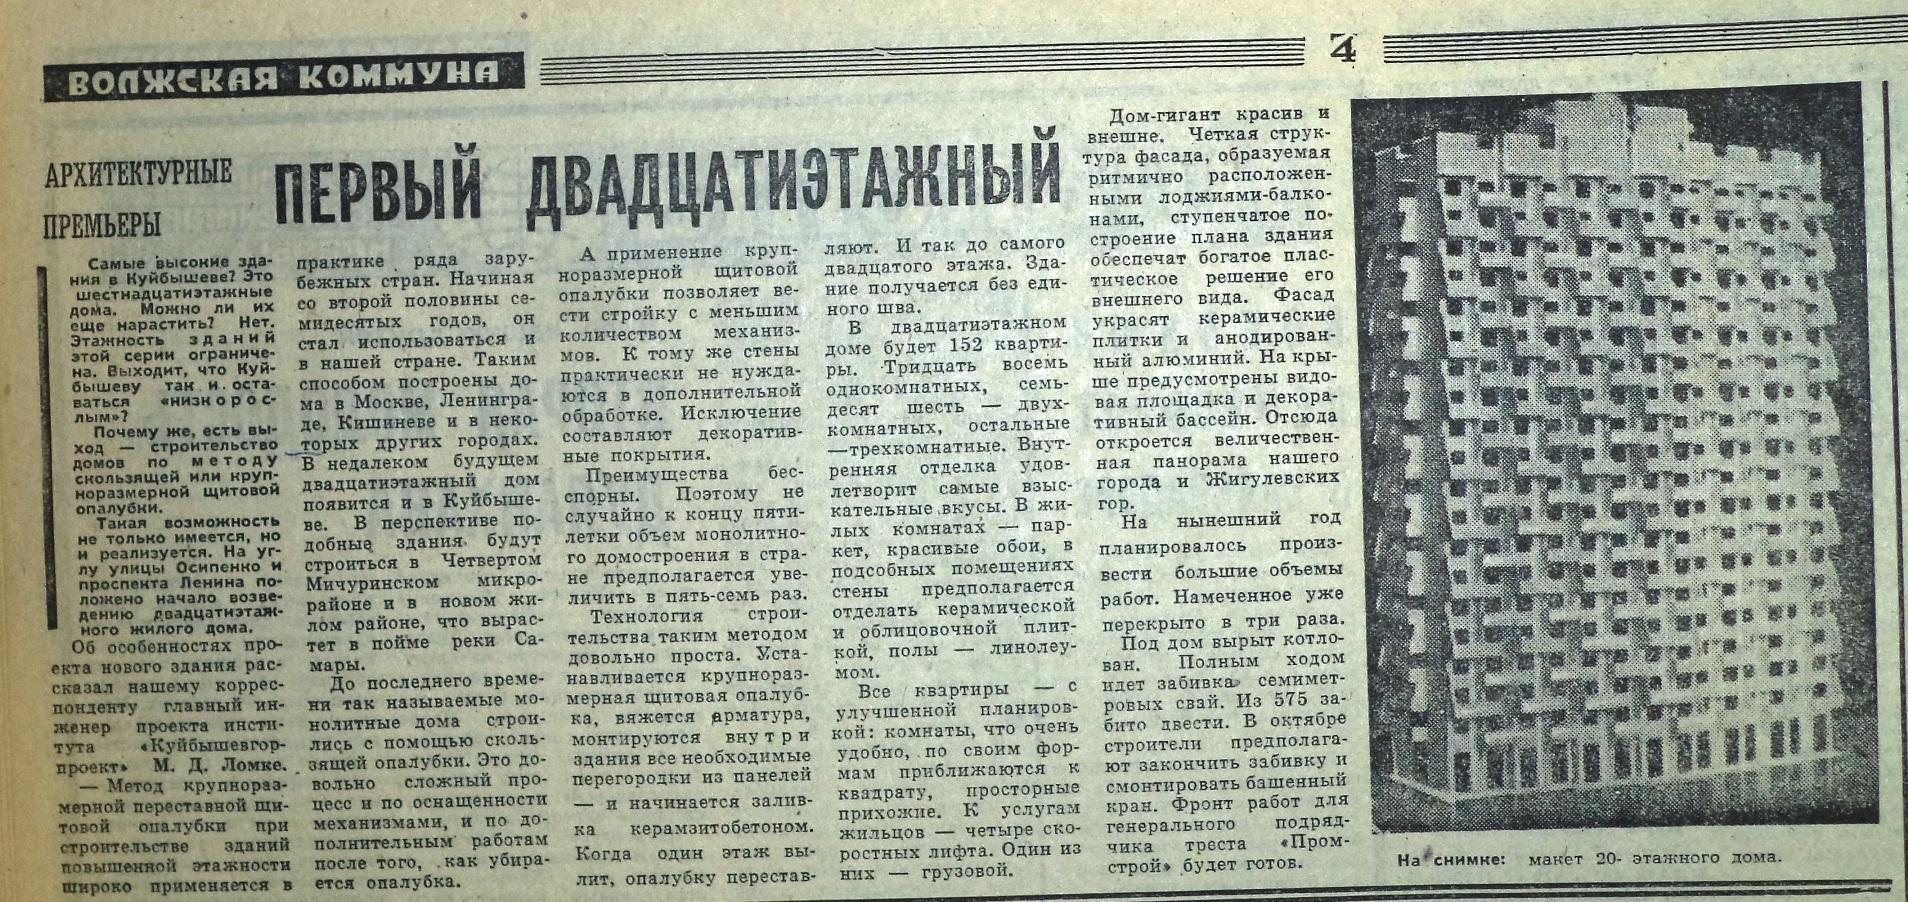 Осипенко-ФОТО-64-ВКа-1979-10-18-проект Рашпиля